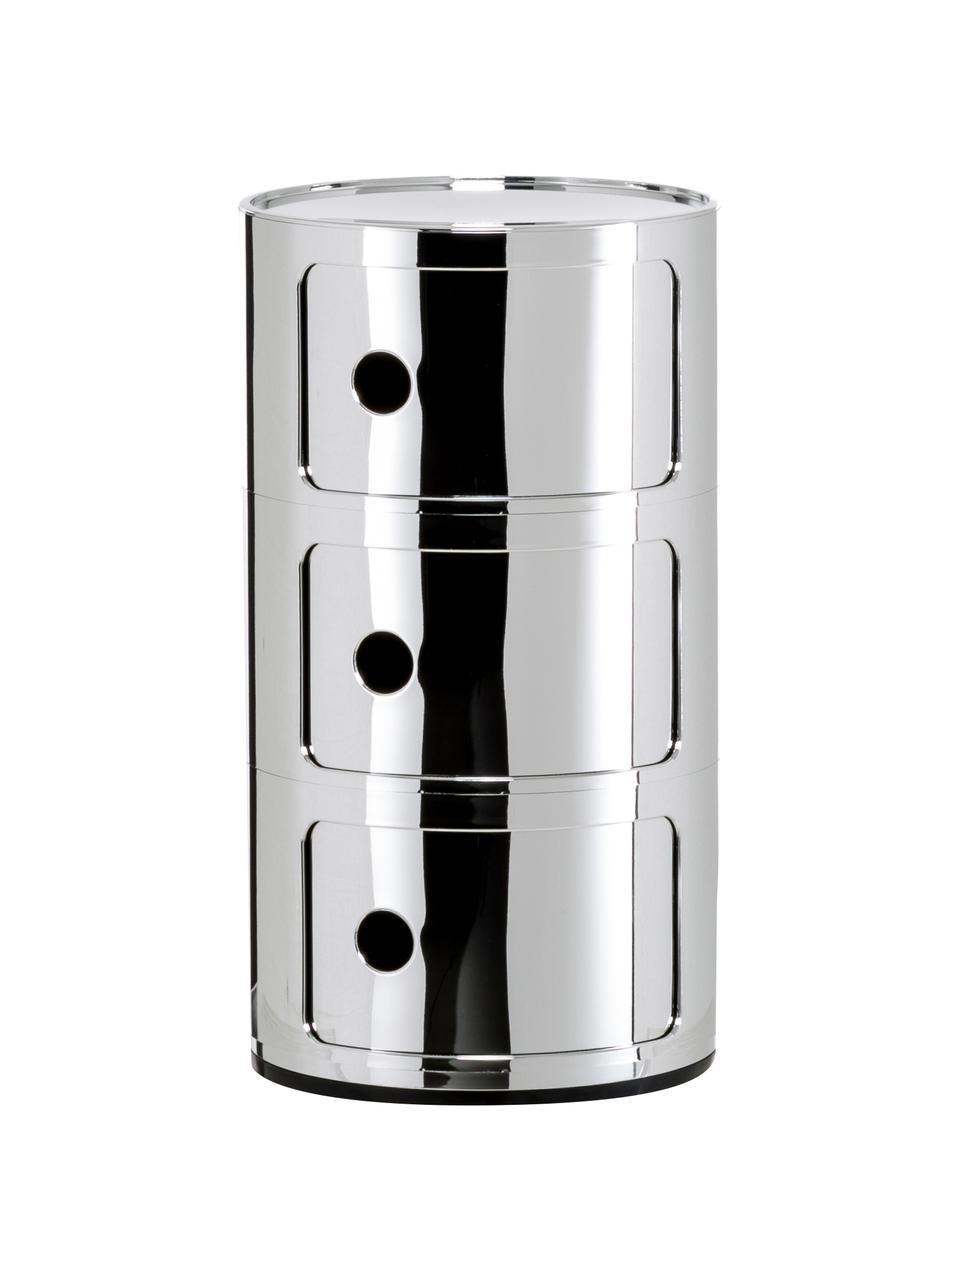 Design bijzettafel Componibile, 3 vakken, Gelakt kunststof (ABS), Chroomkleurig, Ø 32 x H 59 cm